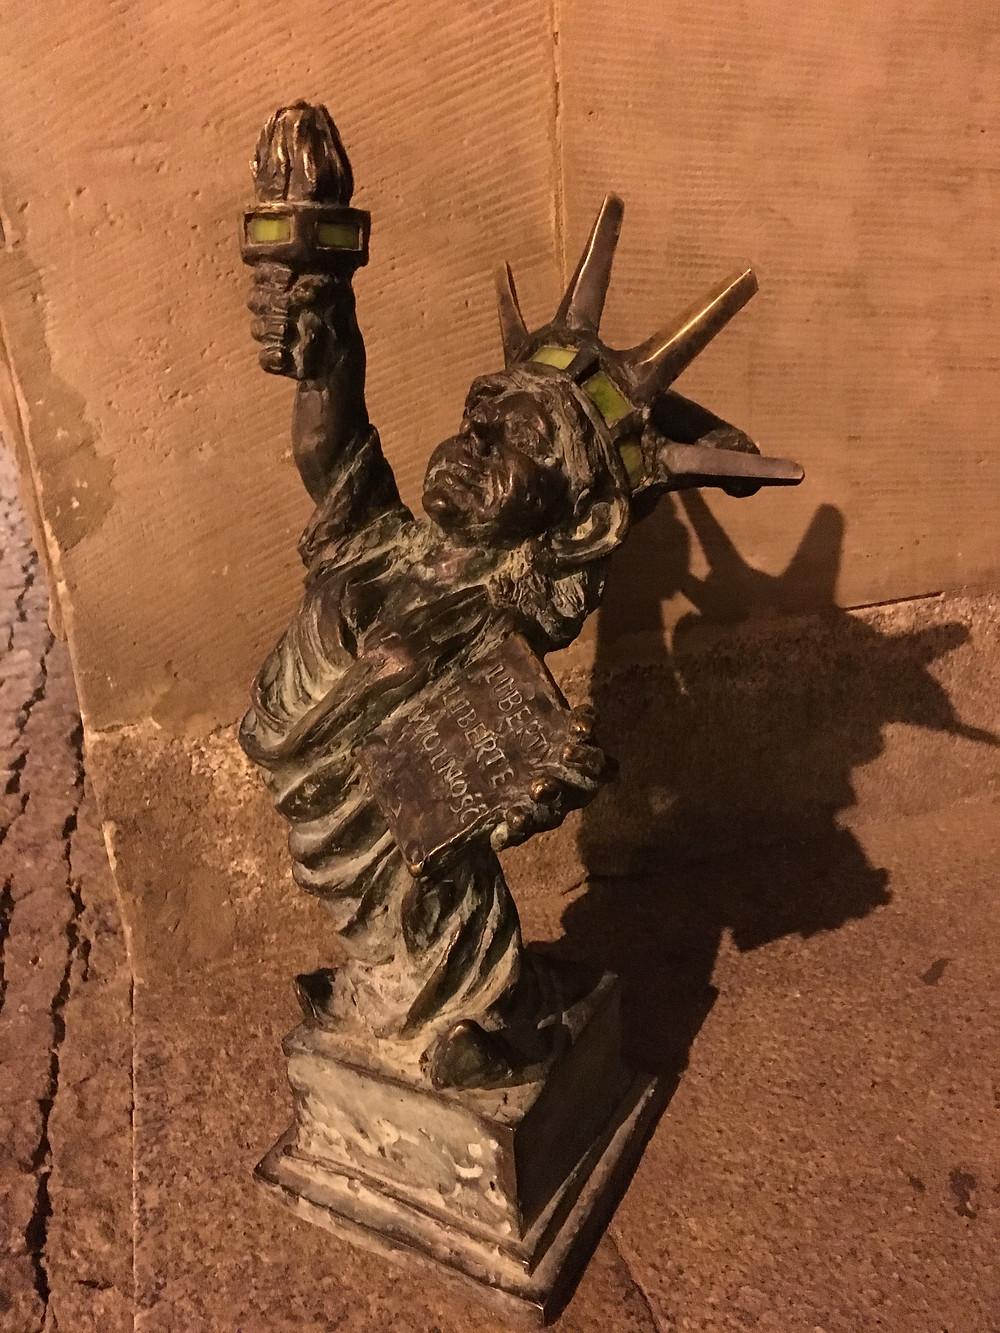 Wroclaw Dwarf, Lady Liberty